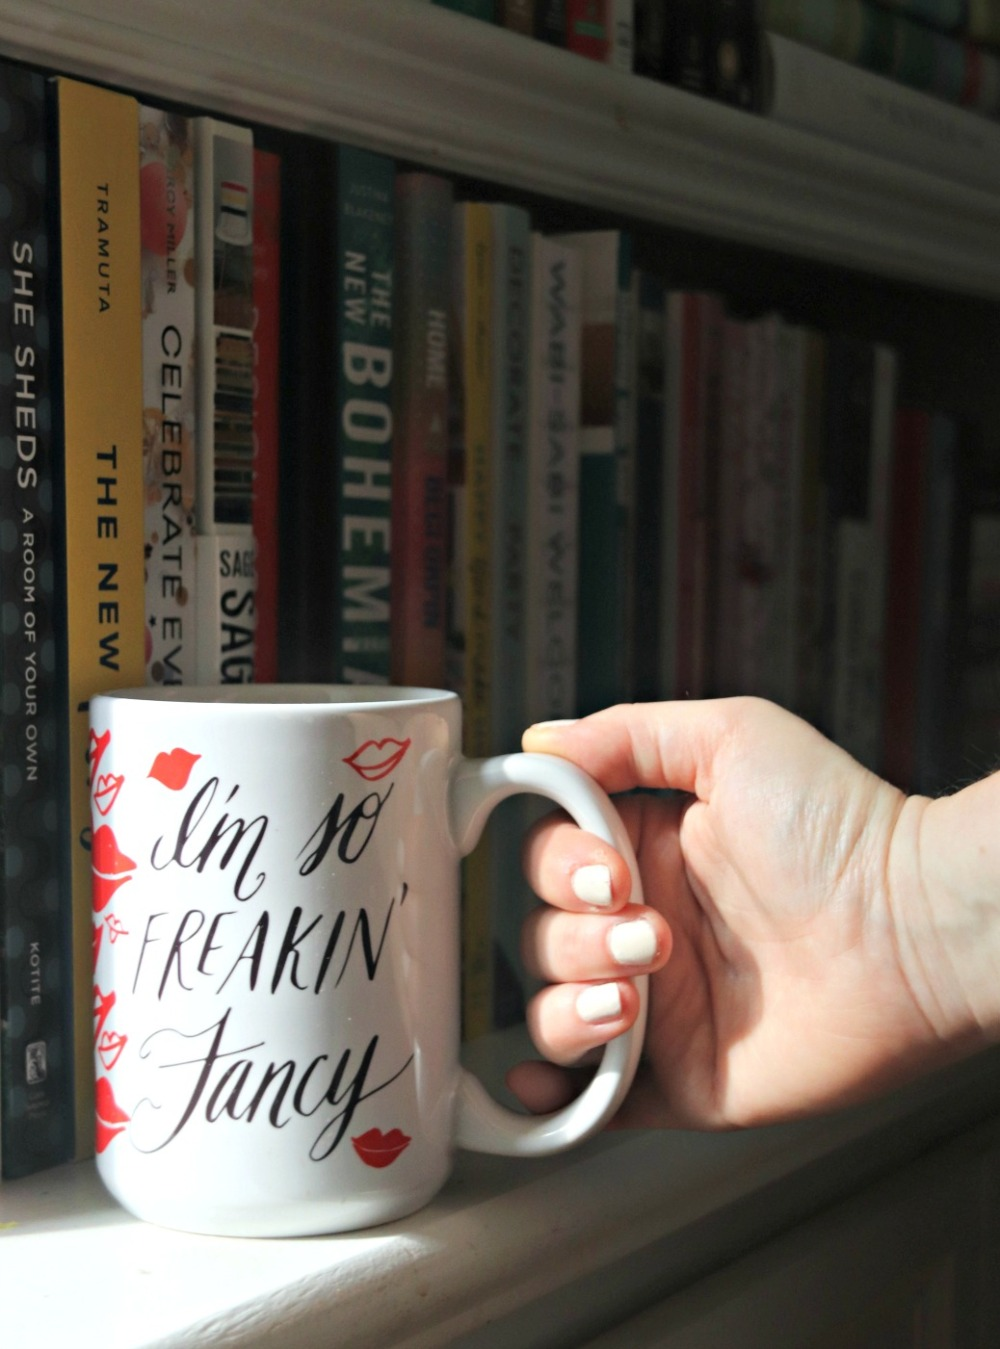 Thimblepress I'm so freakin' fancy mug